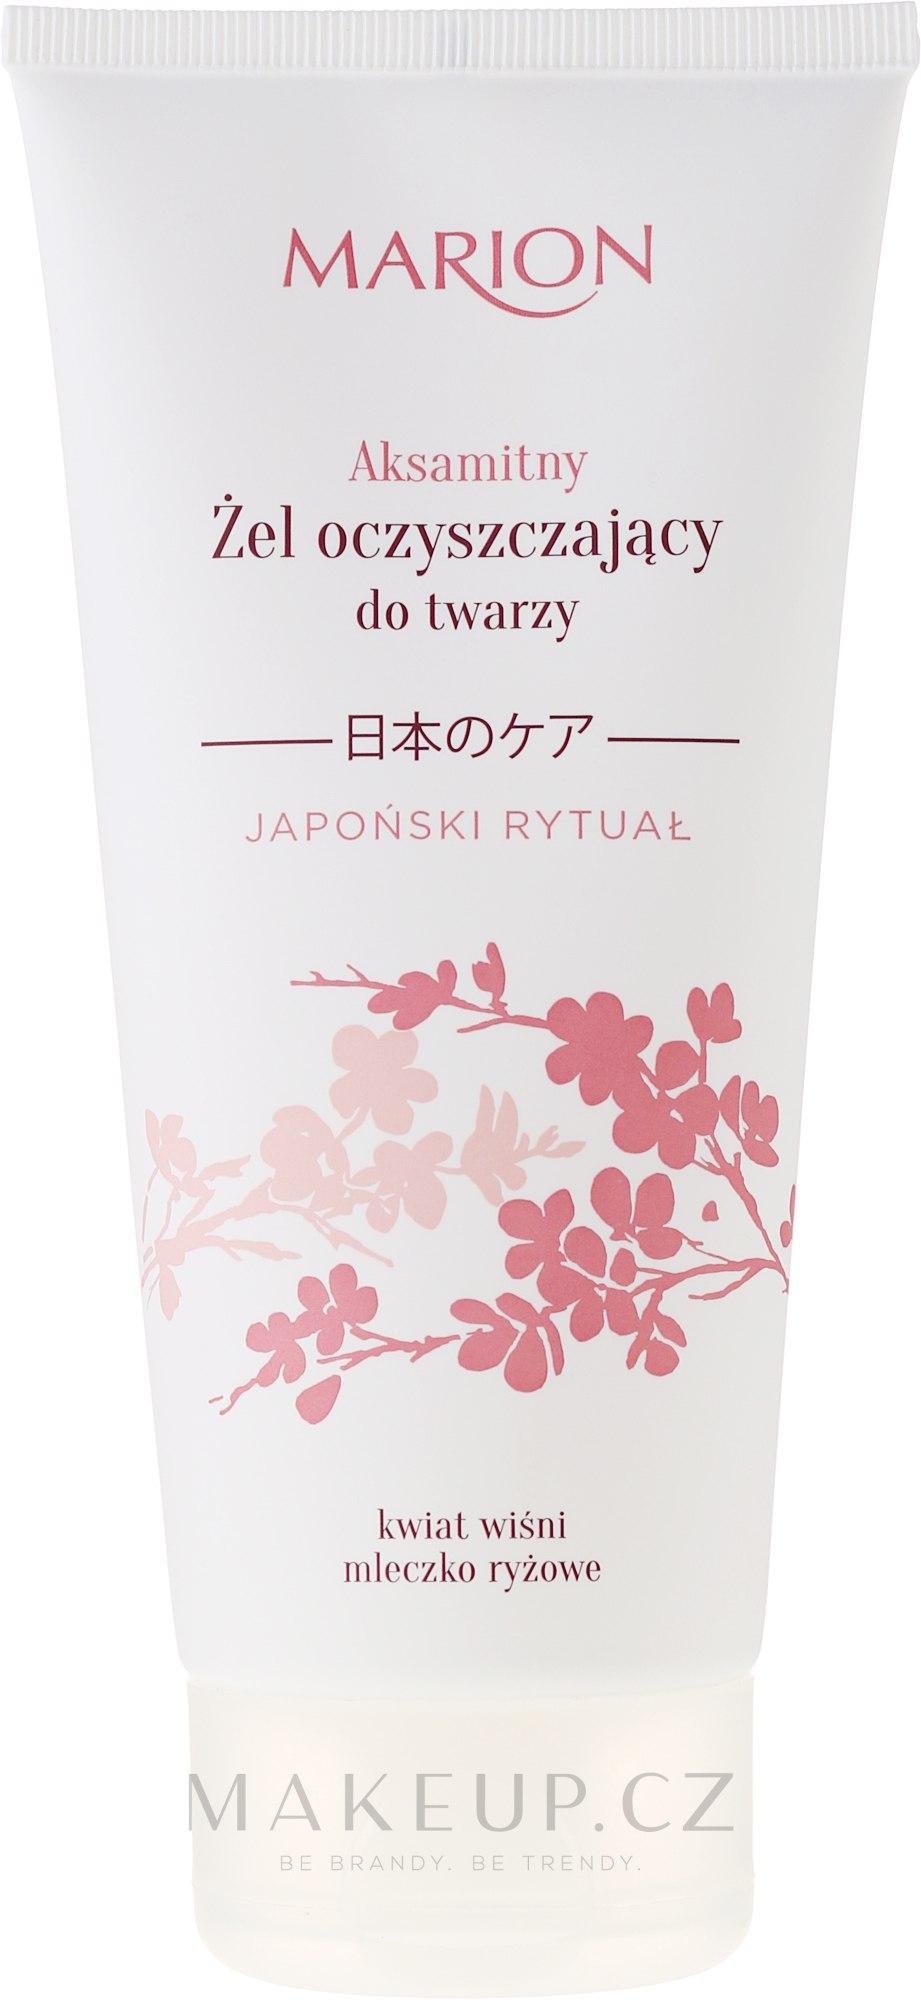 Čistící gel na obličej - Marion Japanese Ritual Velvet Cleansing Gel For Face — foto 150 ml